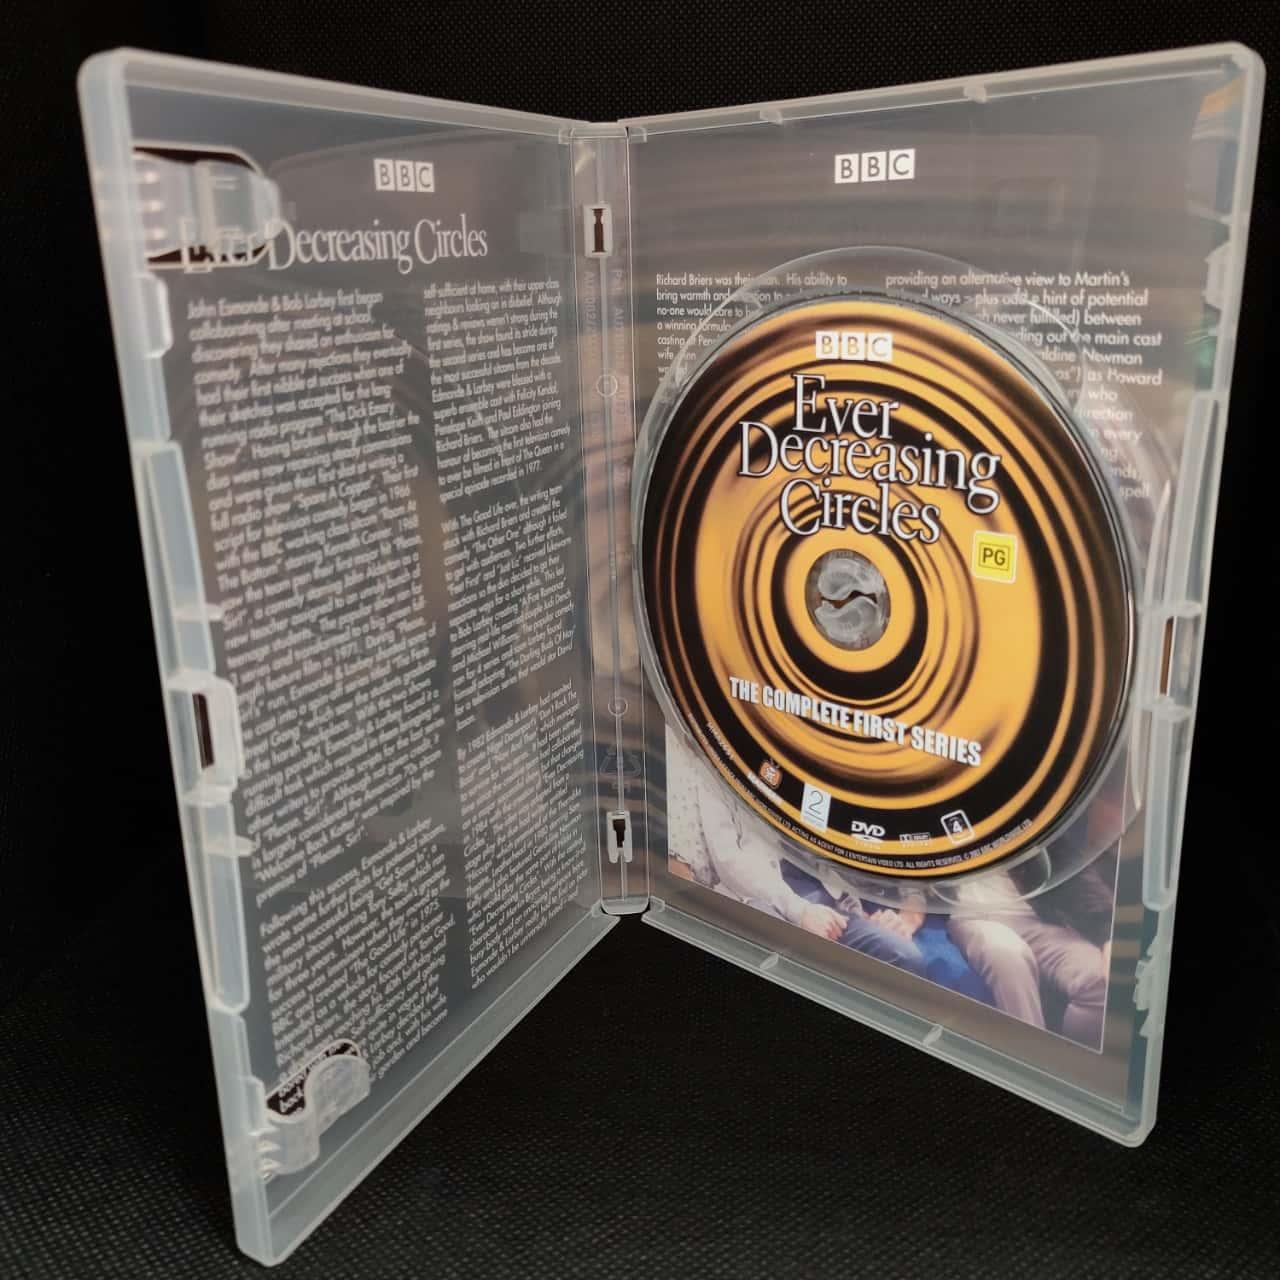 BBC Series Ever Decreasing Circles - Series 1, 2 & 3 Complete